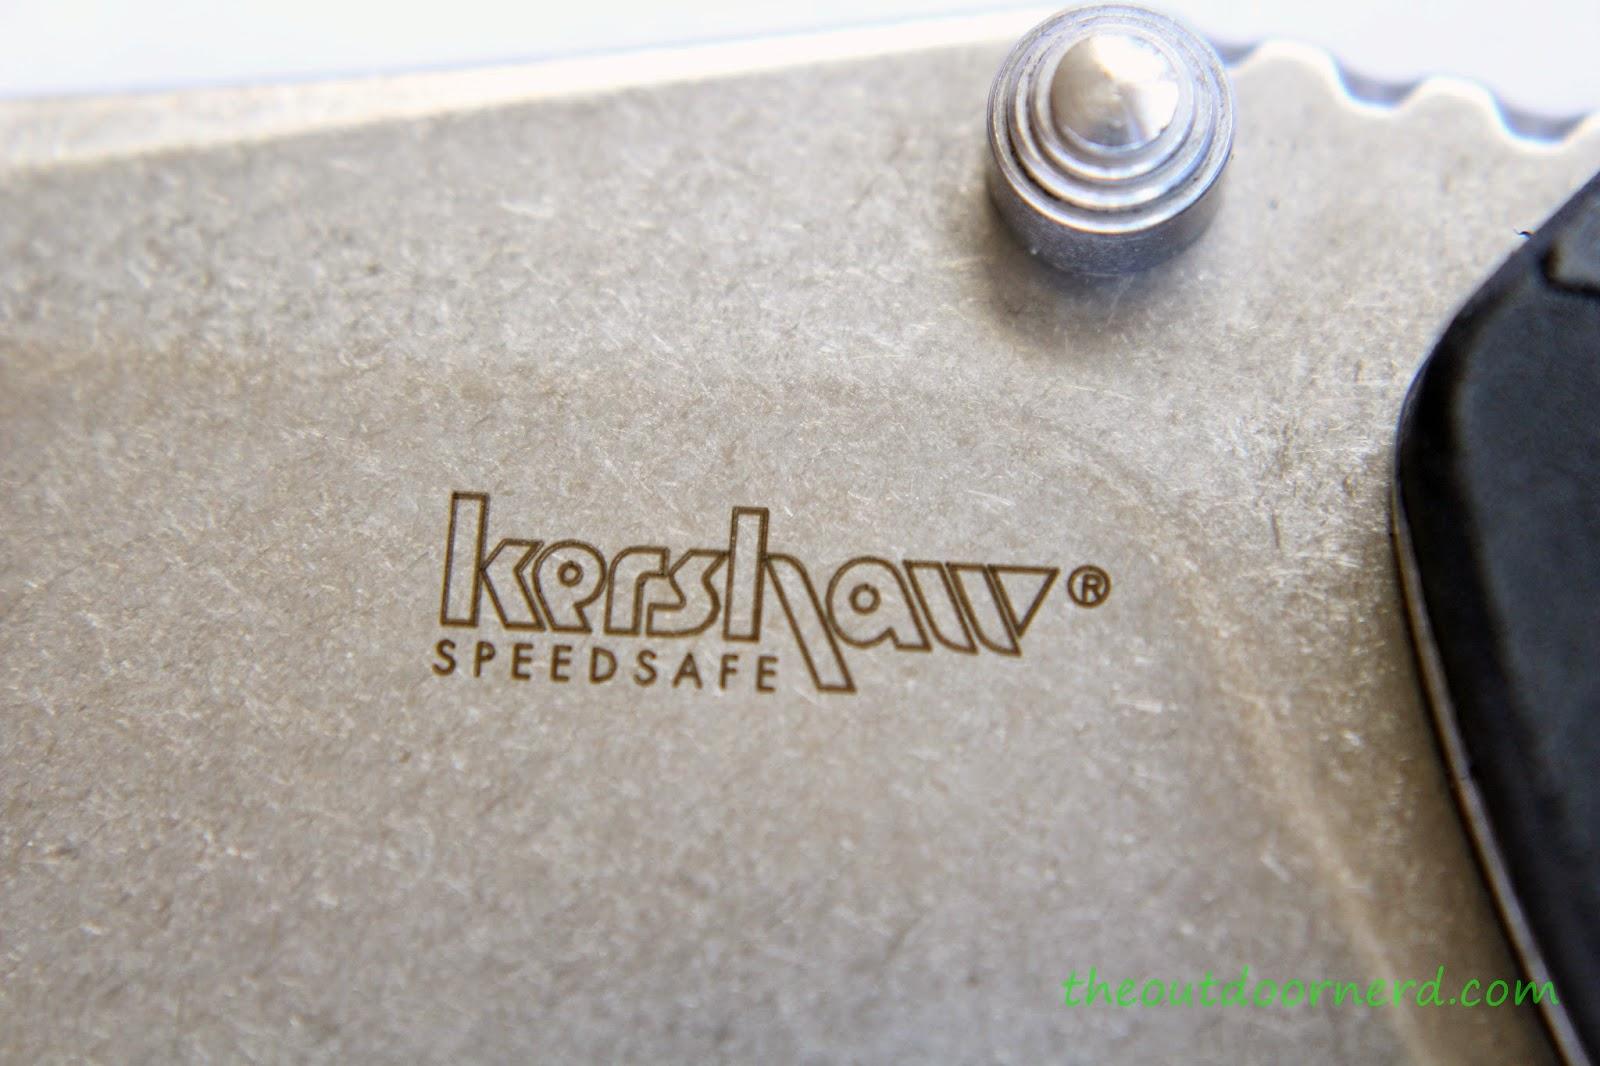 Kershaw Swerve EDC Pocket Knife: Product View - Logo